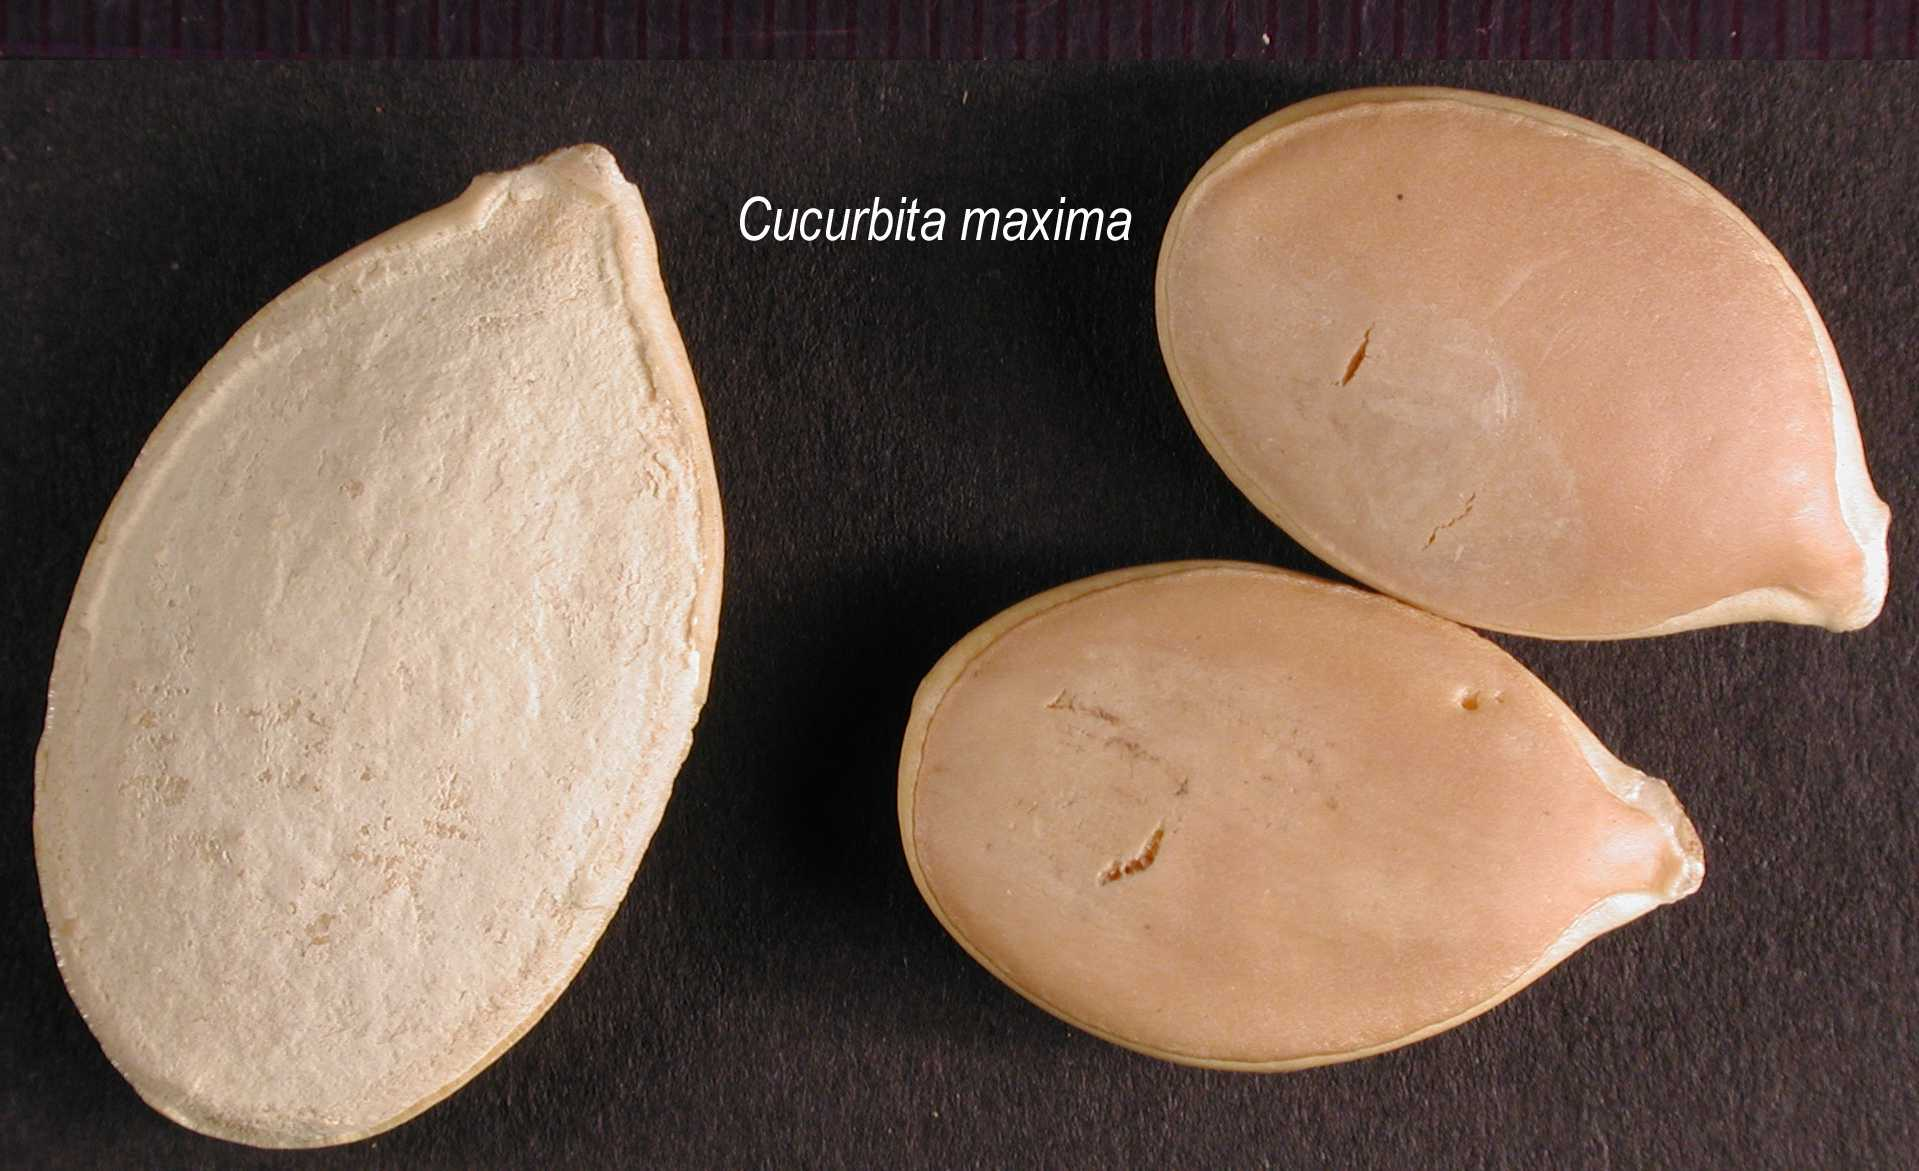 Cucurbita-maxima-seed 278